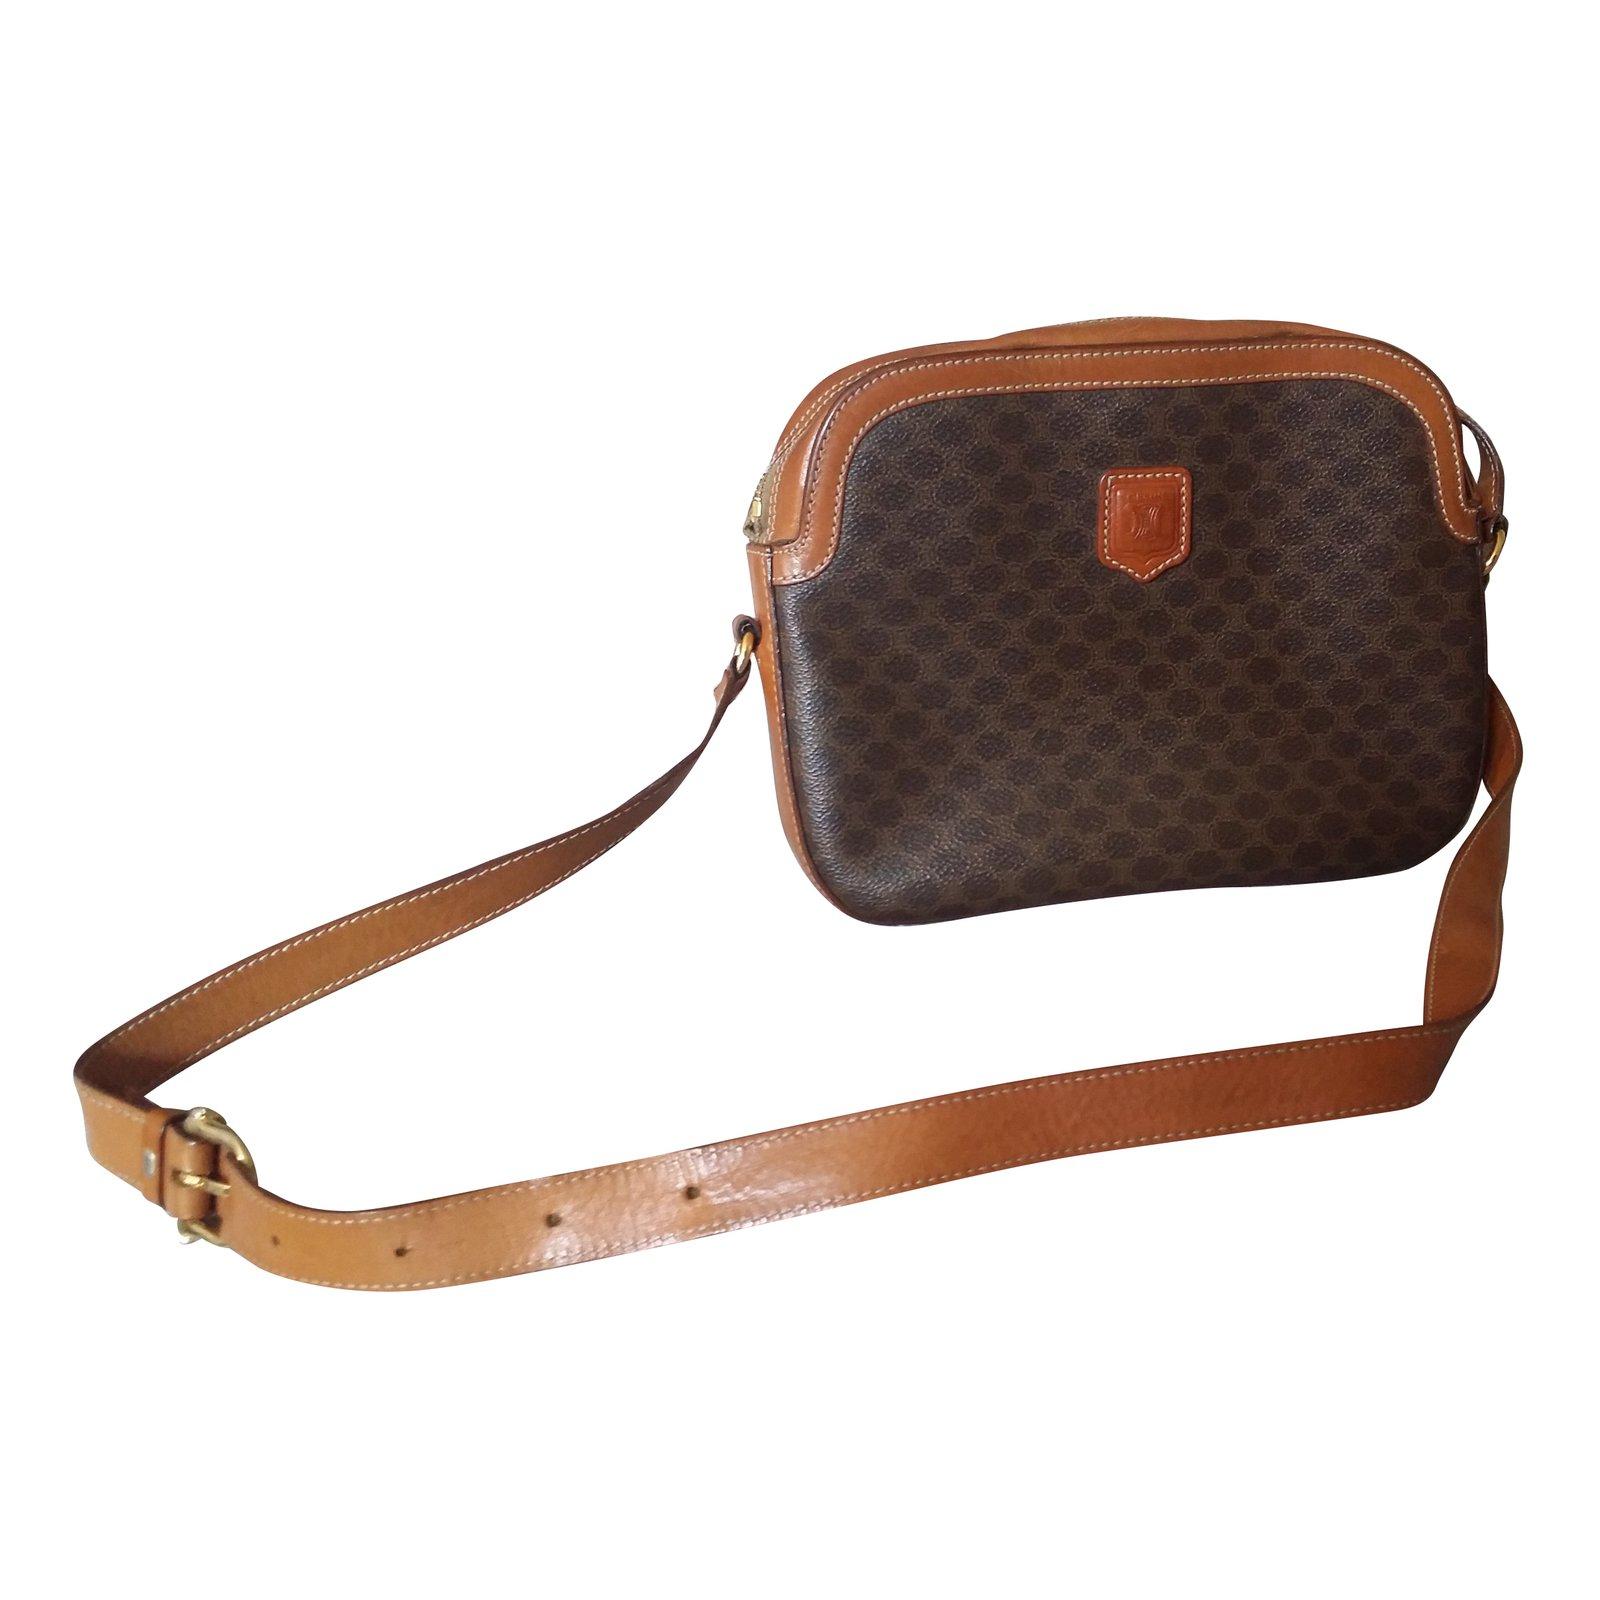 072730641d2b Céline Vintage bag Handbags Leather Brown ref.74550 - Joli Closet